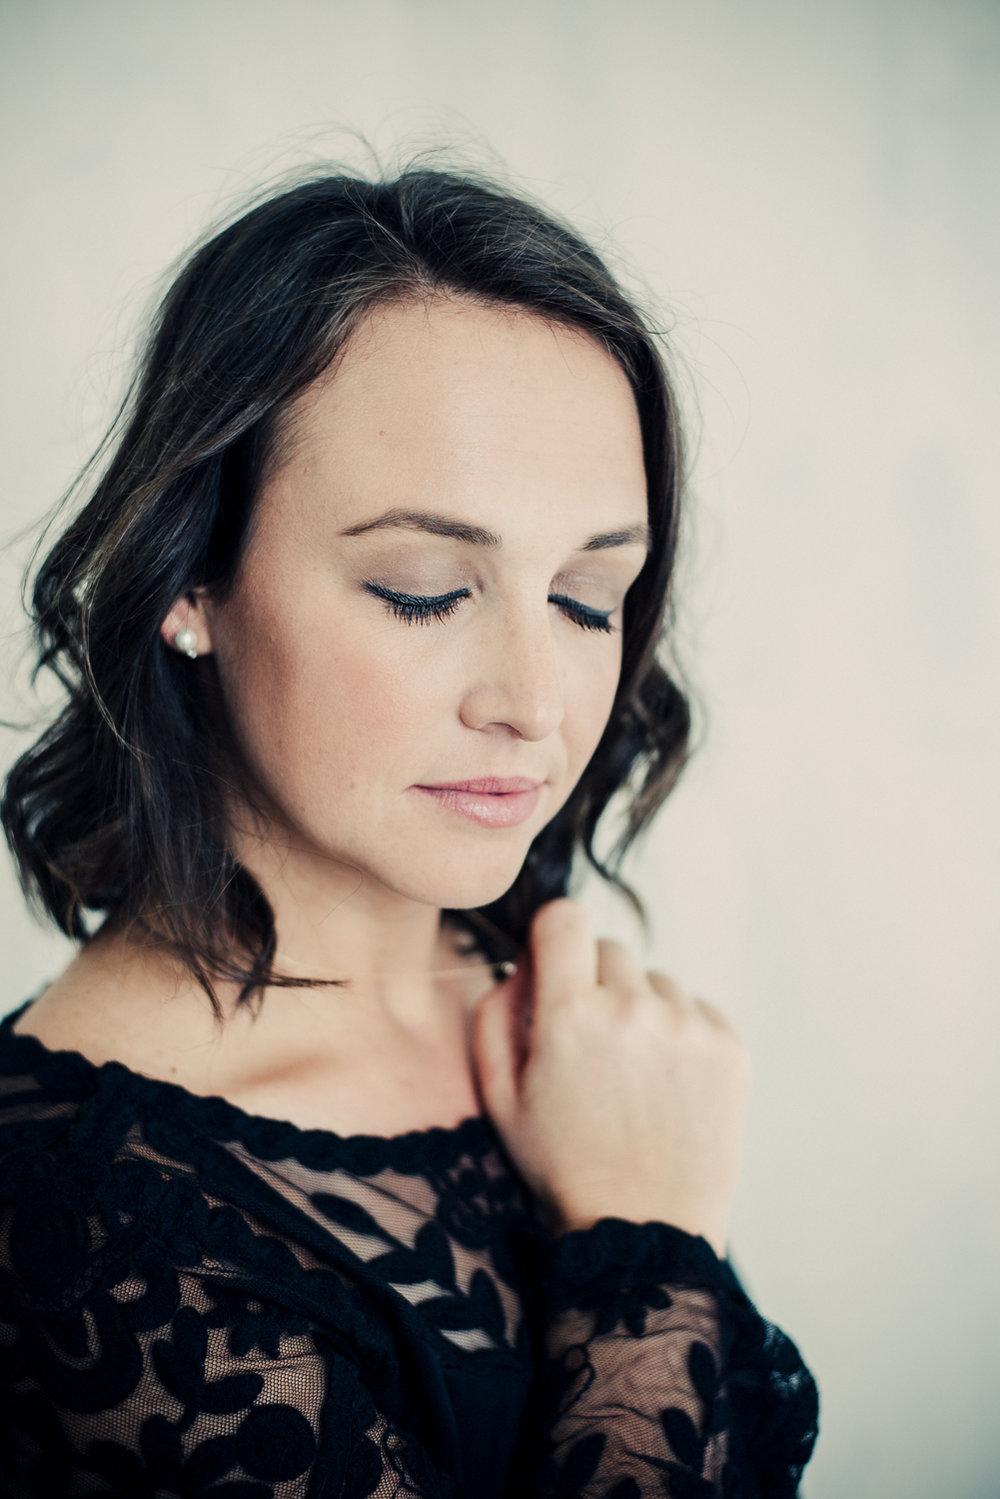 Allison | the lost | dream | explore | create | inspire | rawbeauty | beauty photographer | san diego-4.jpg